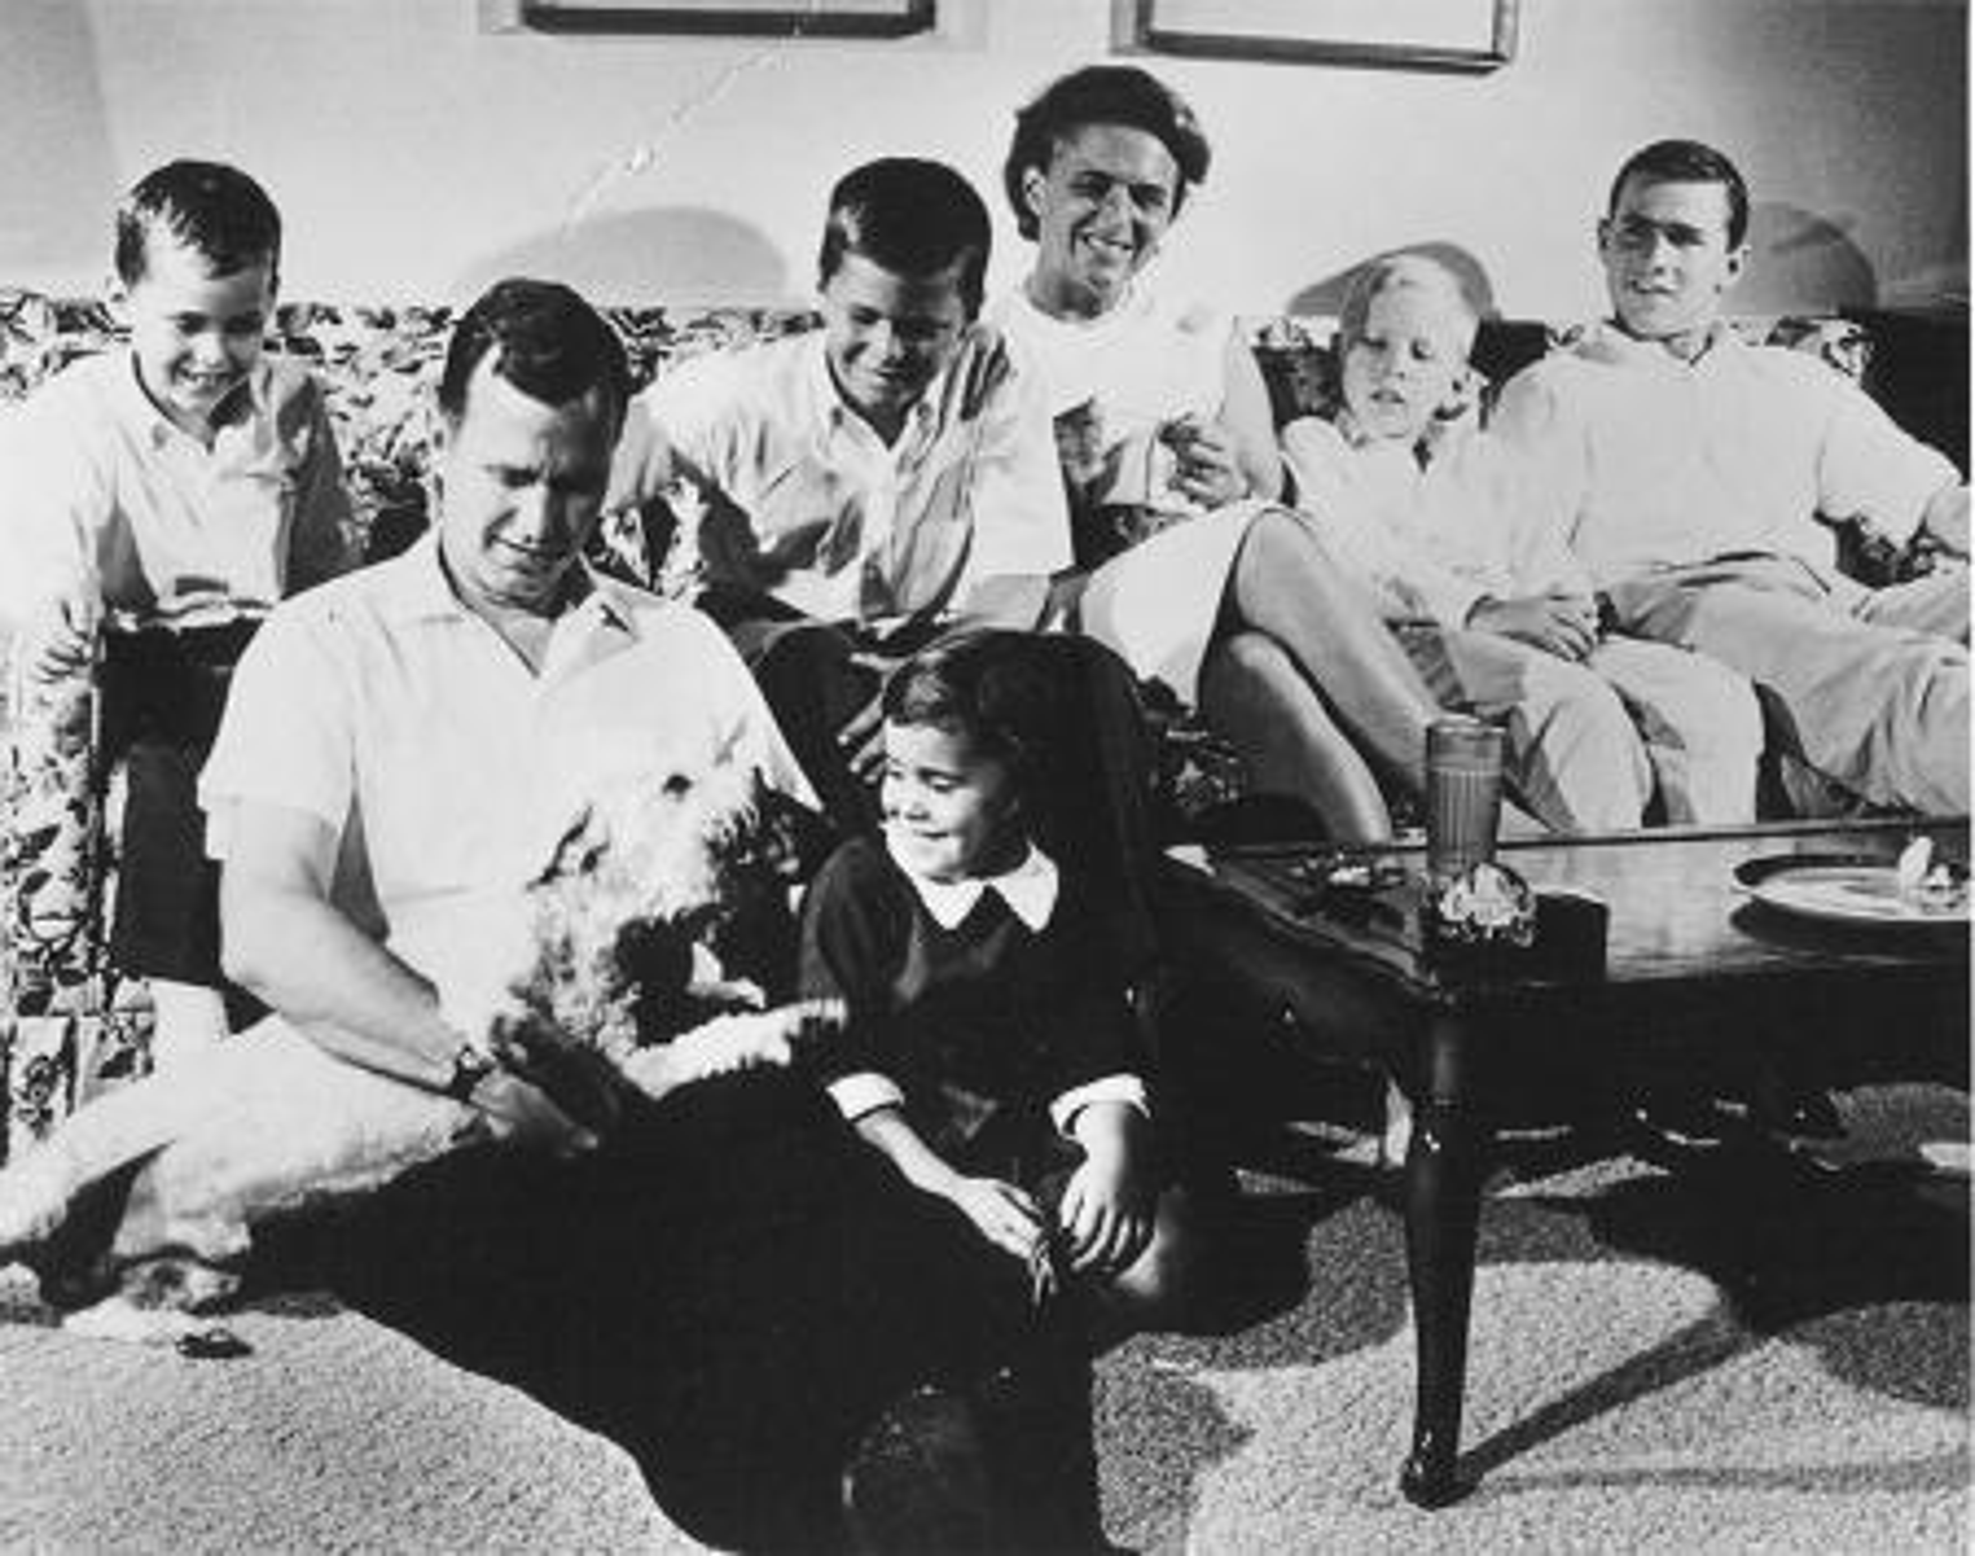 Barbara Bush with George H.W. bush and their children